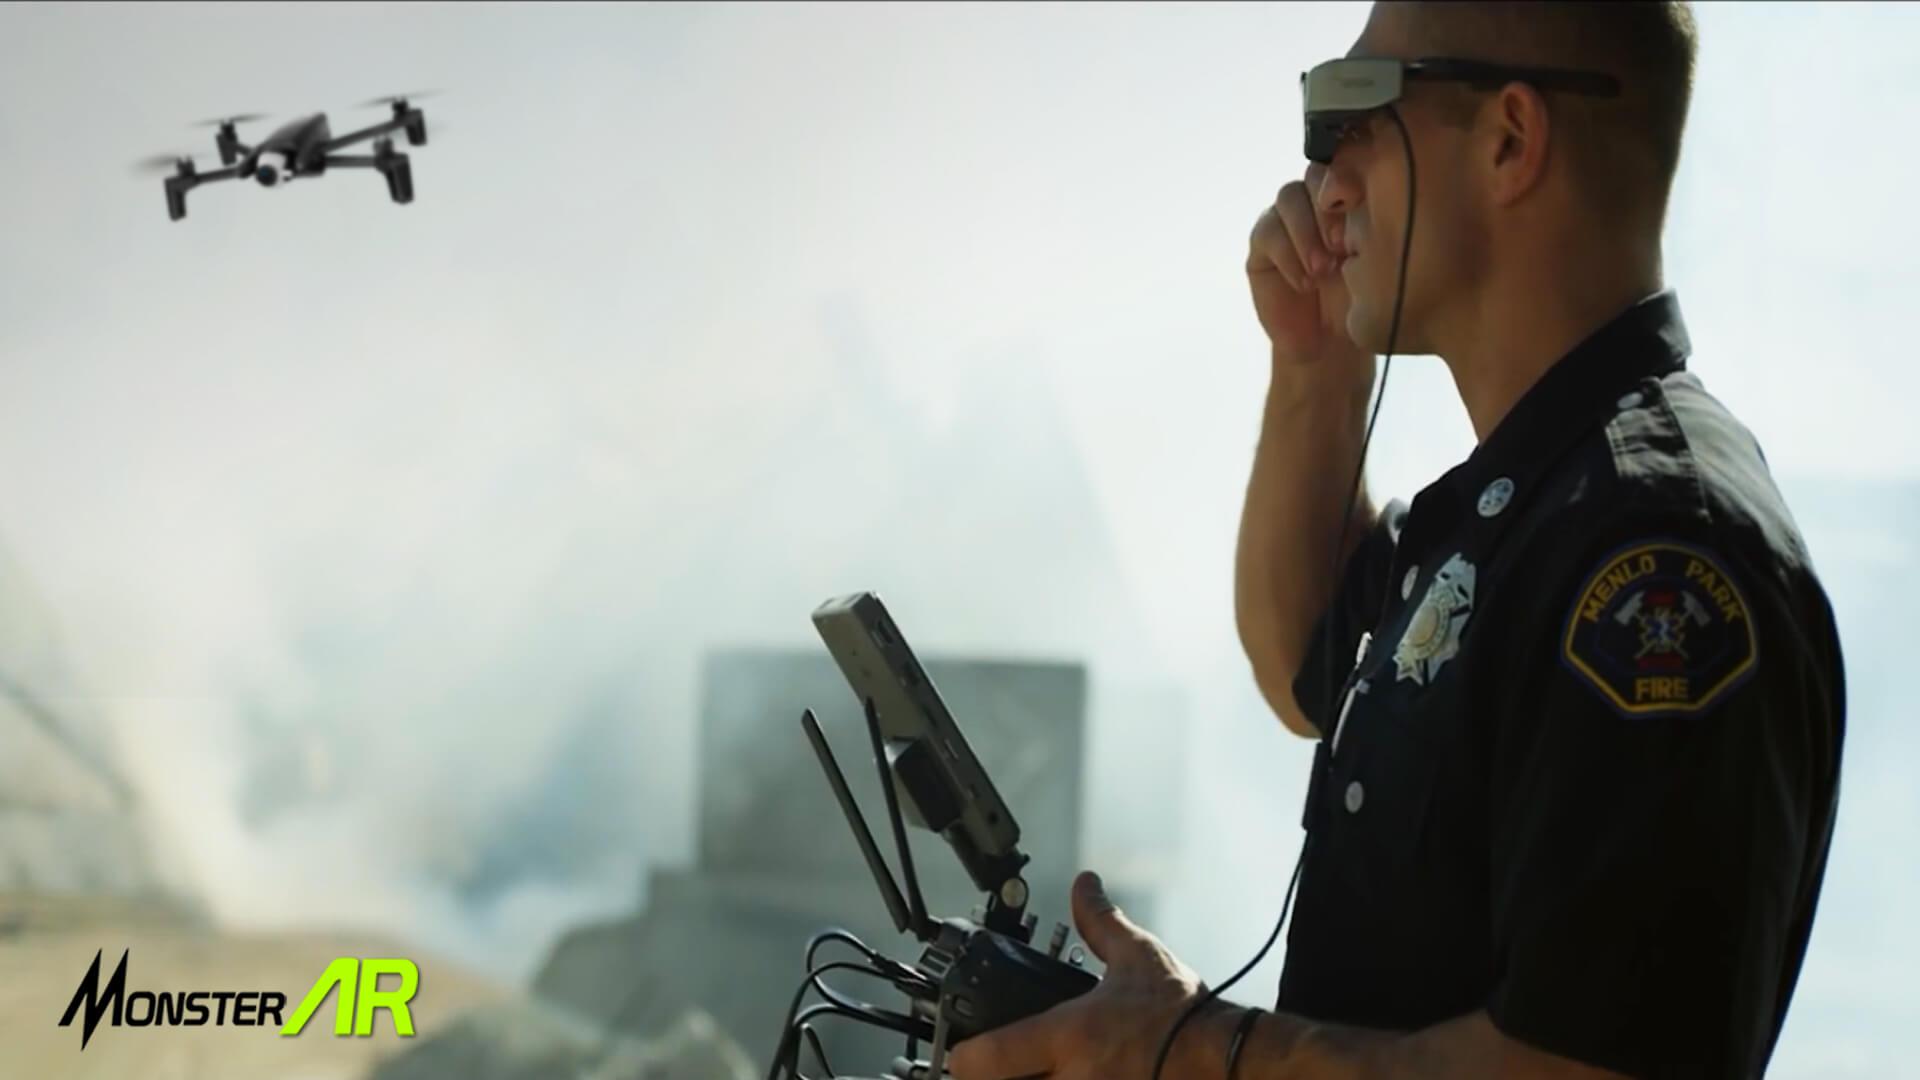 kacamata ar dan drone